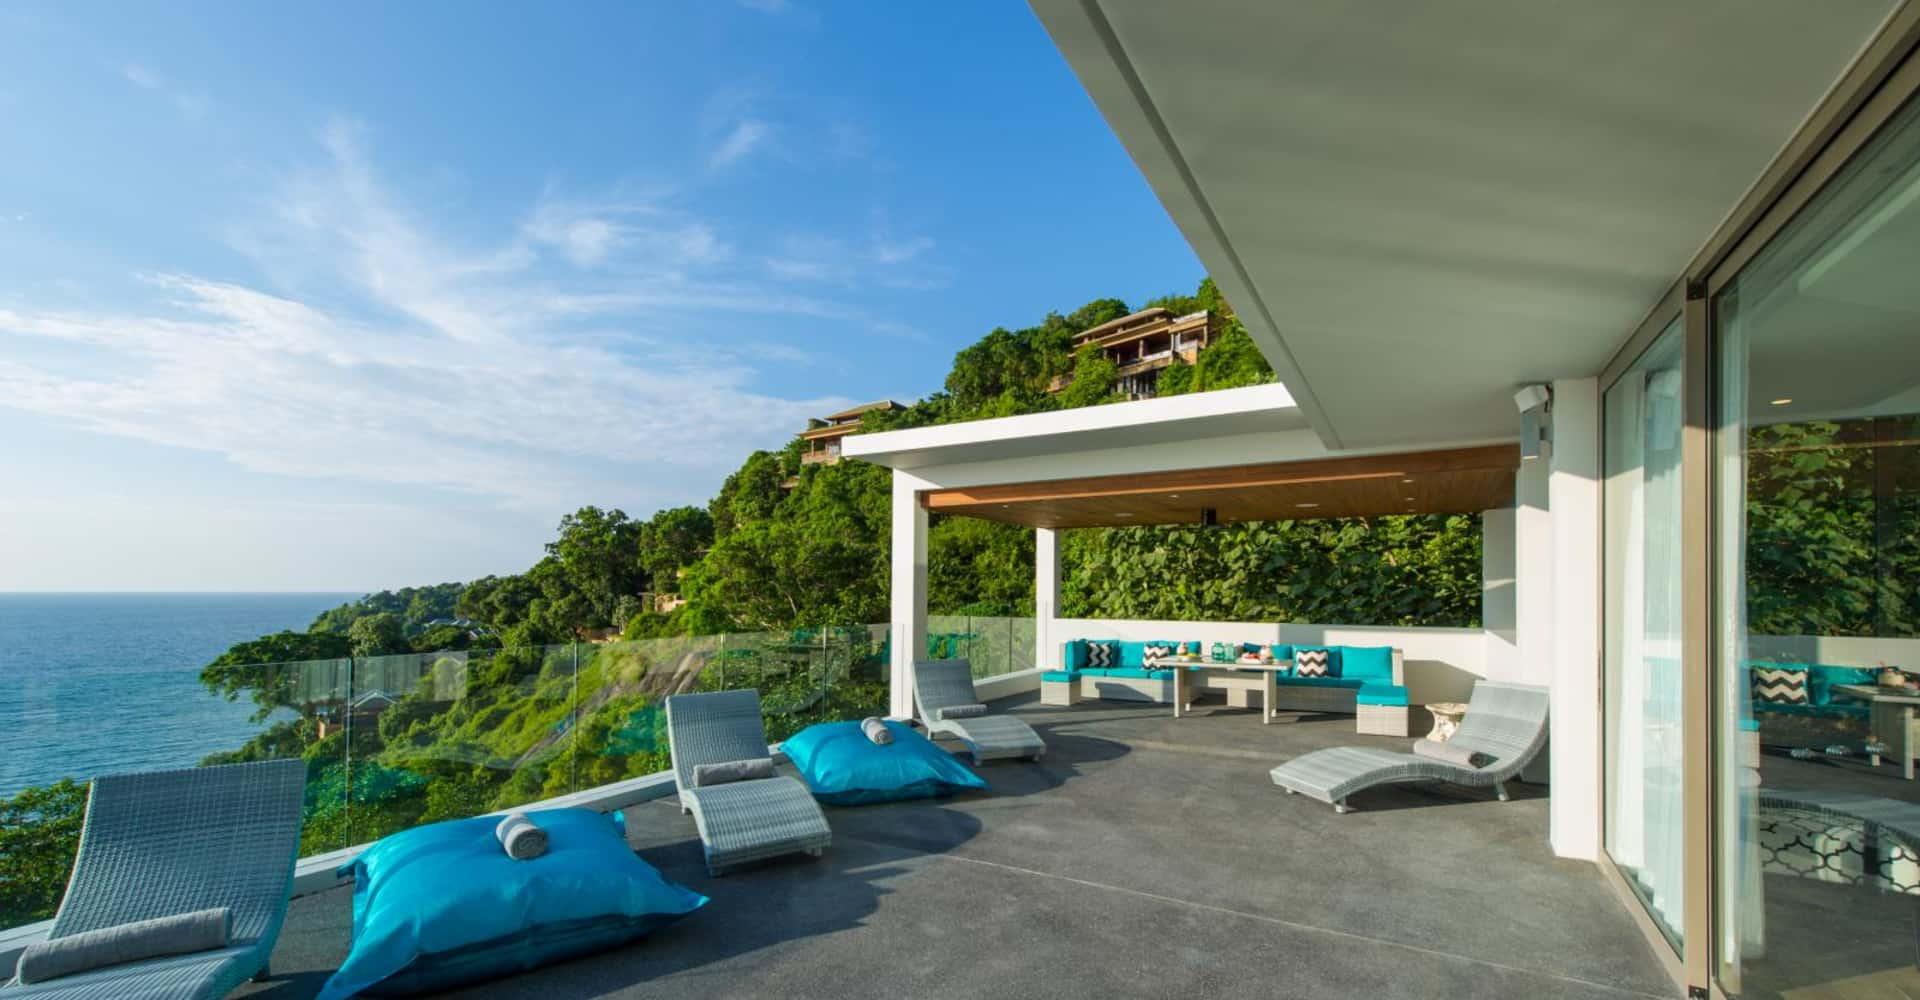 SILVER MOON & MOON SHADOW VILLAS - The Pavilions Residences